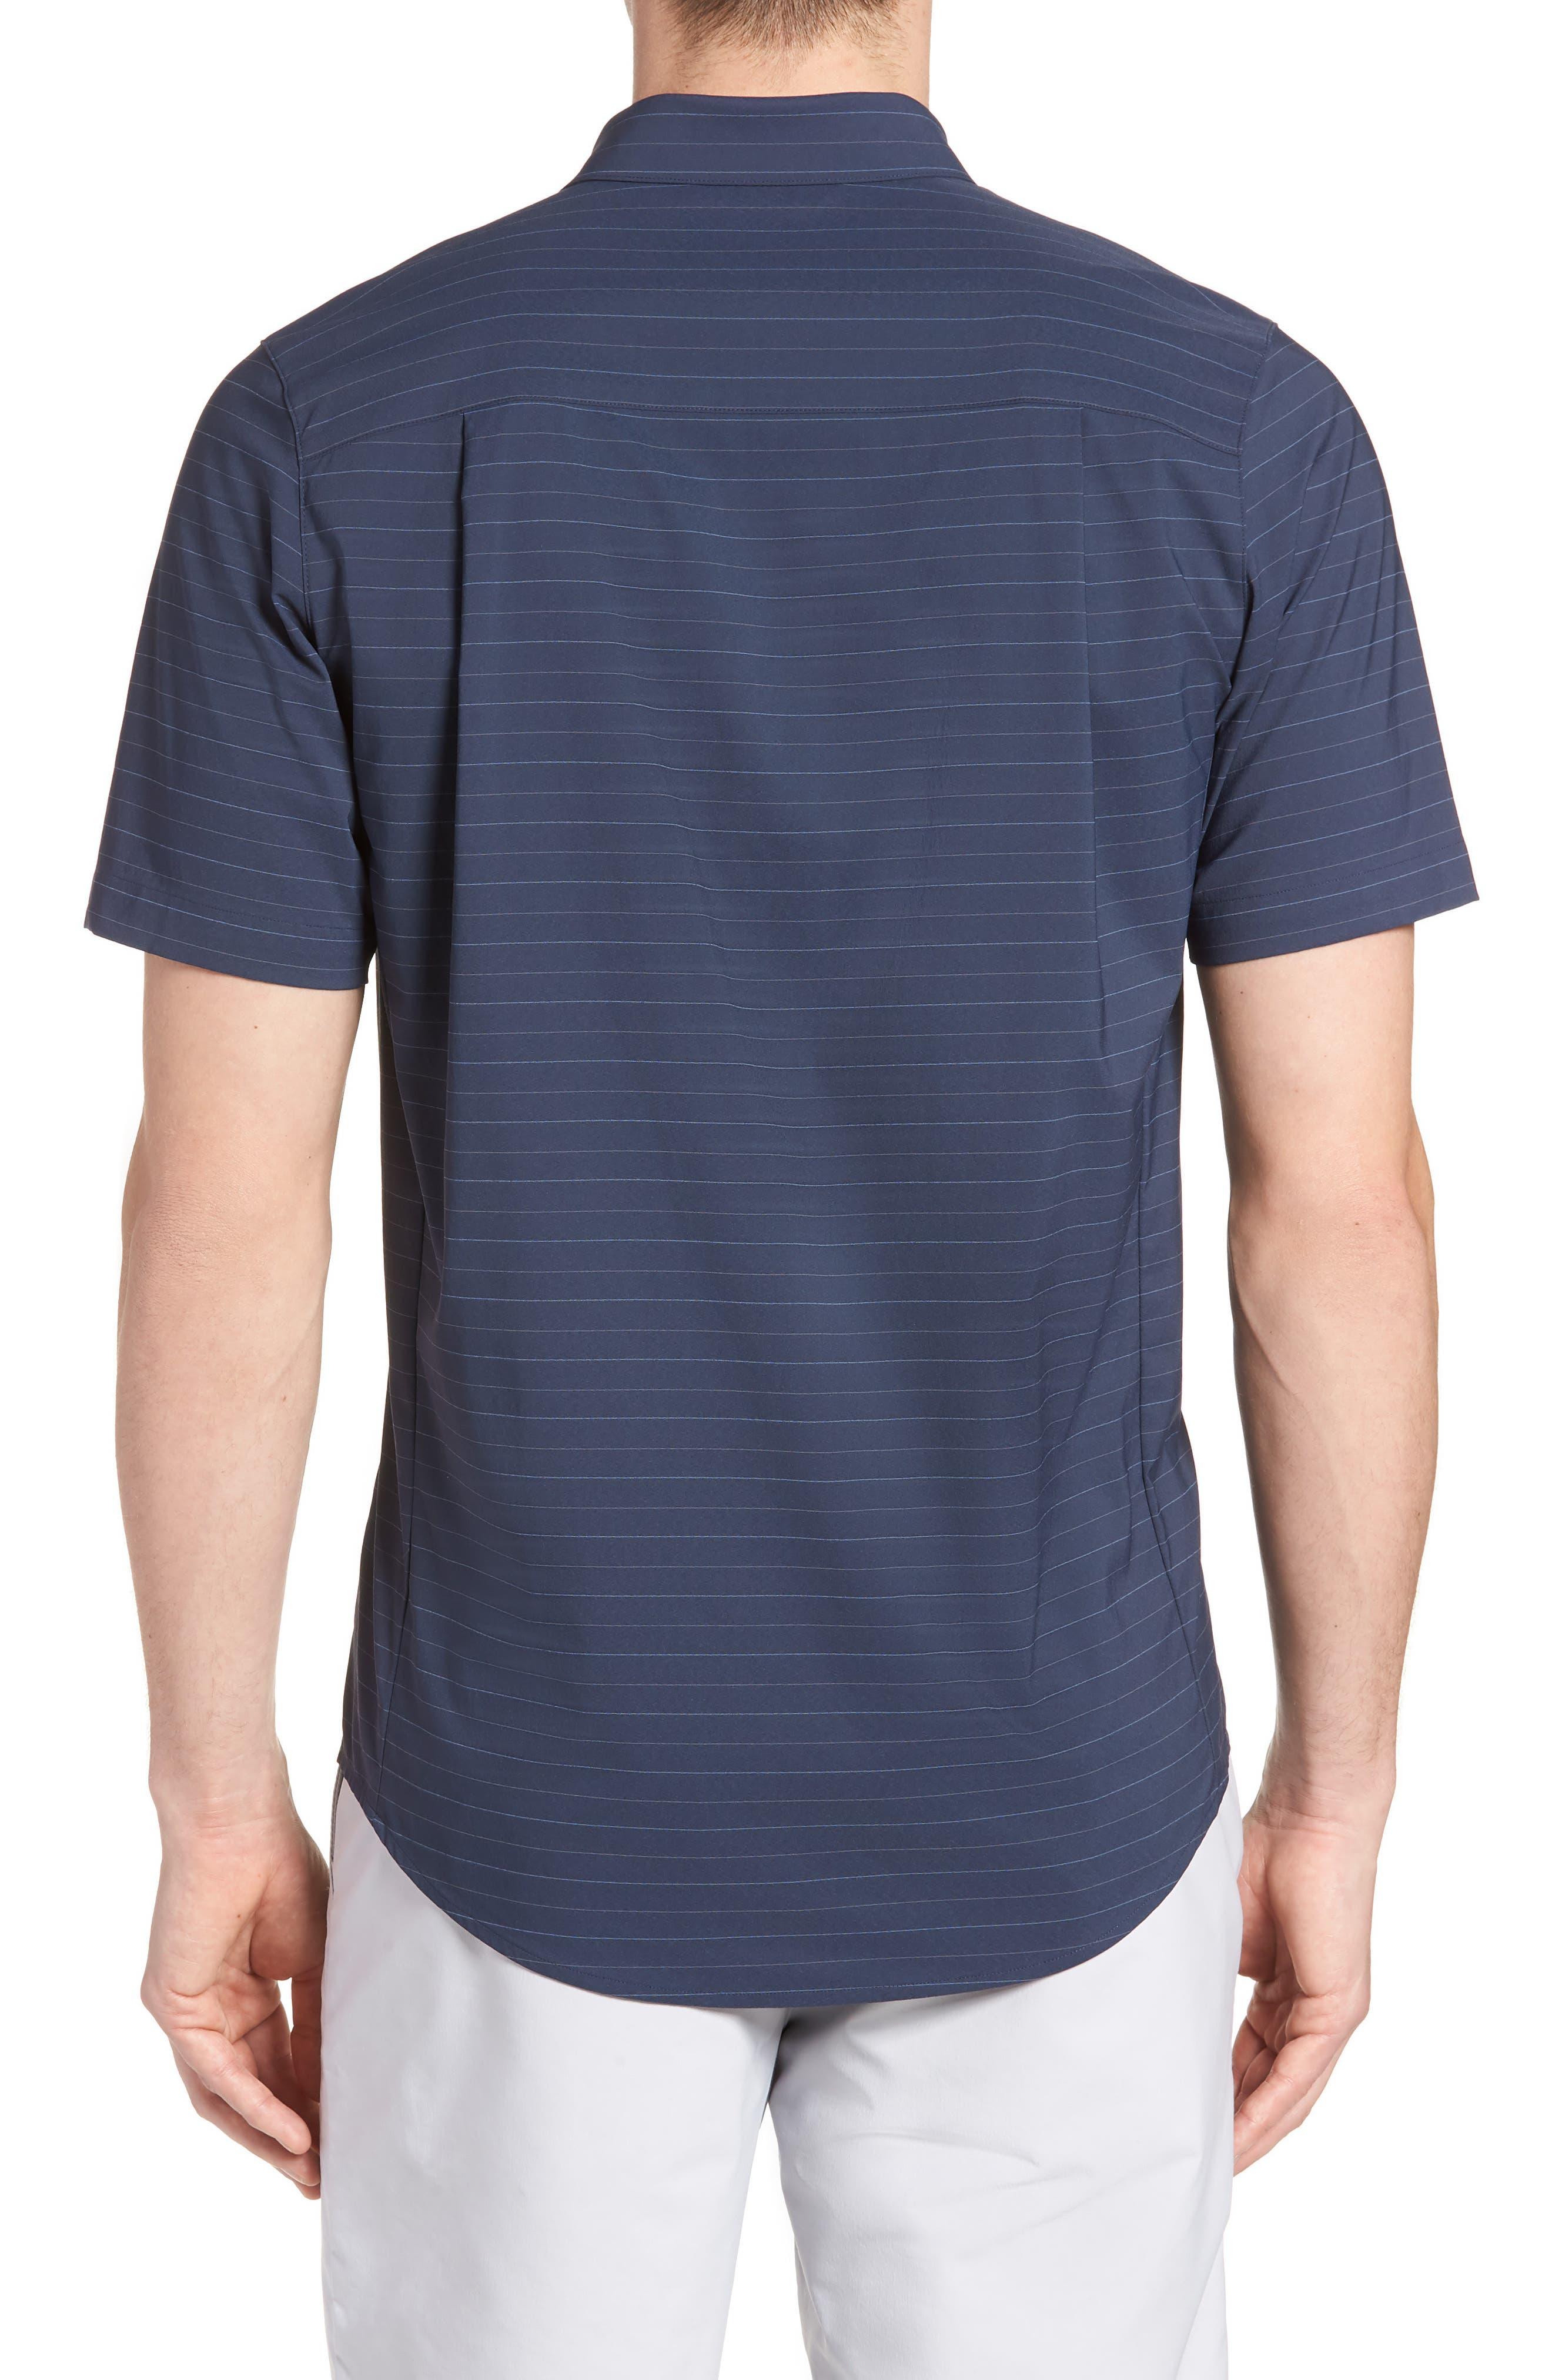 Vagabond Regular Fit Sport Shirt,                             Alternate thumbnail 2, color,                             HEATHER BLUE NIGHTS